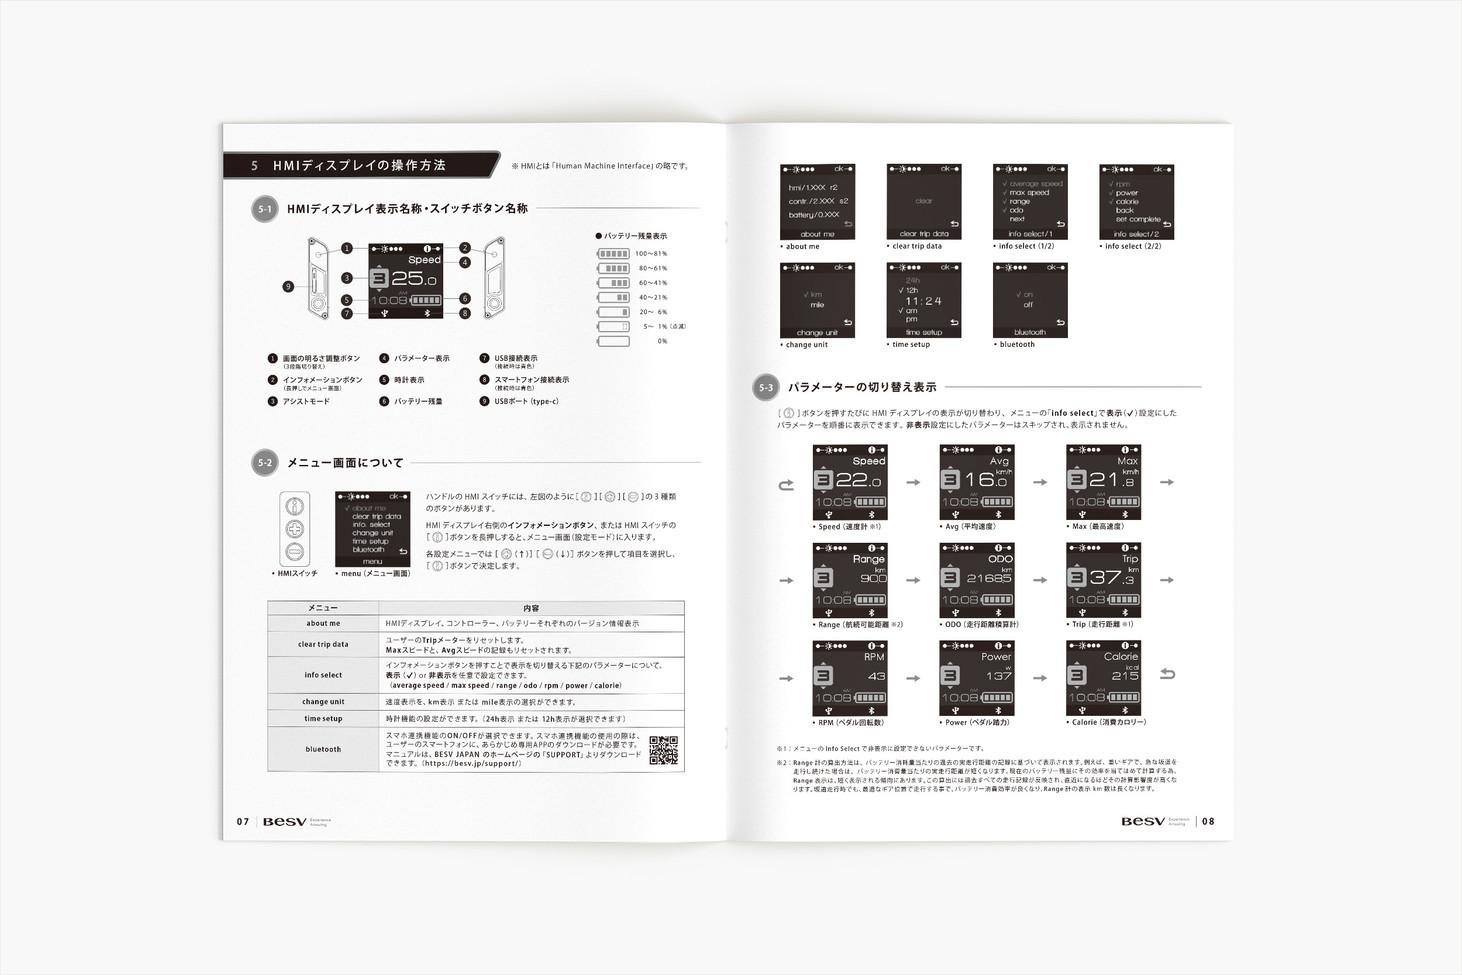 BESV PS1_マニュアル_P7-8.jpg